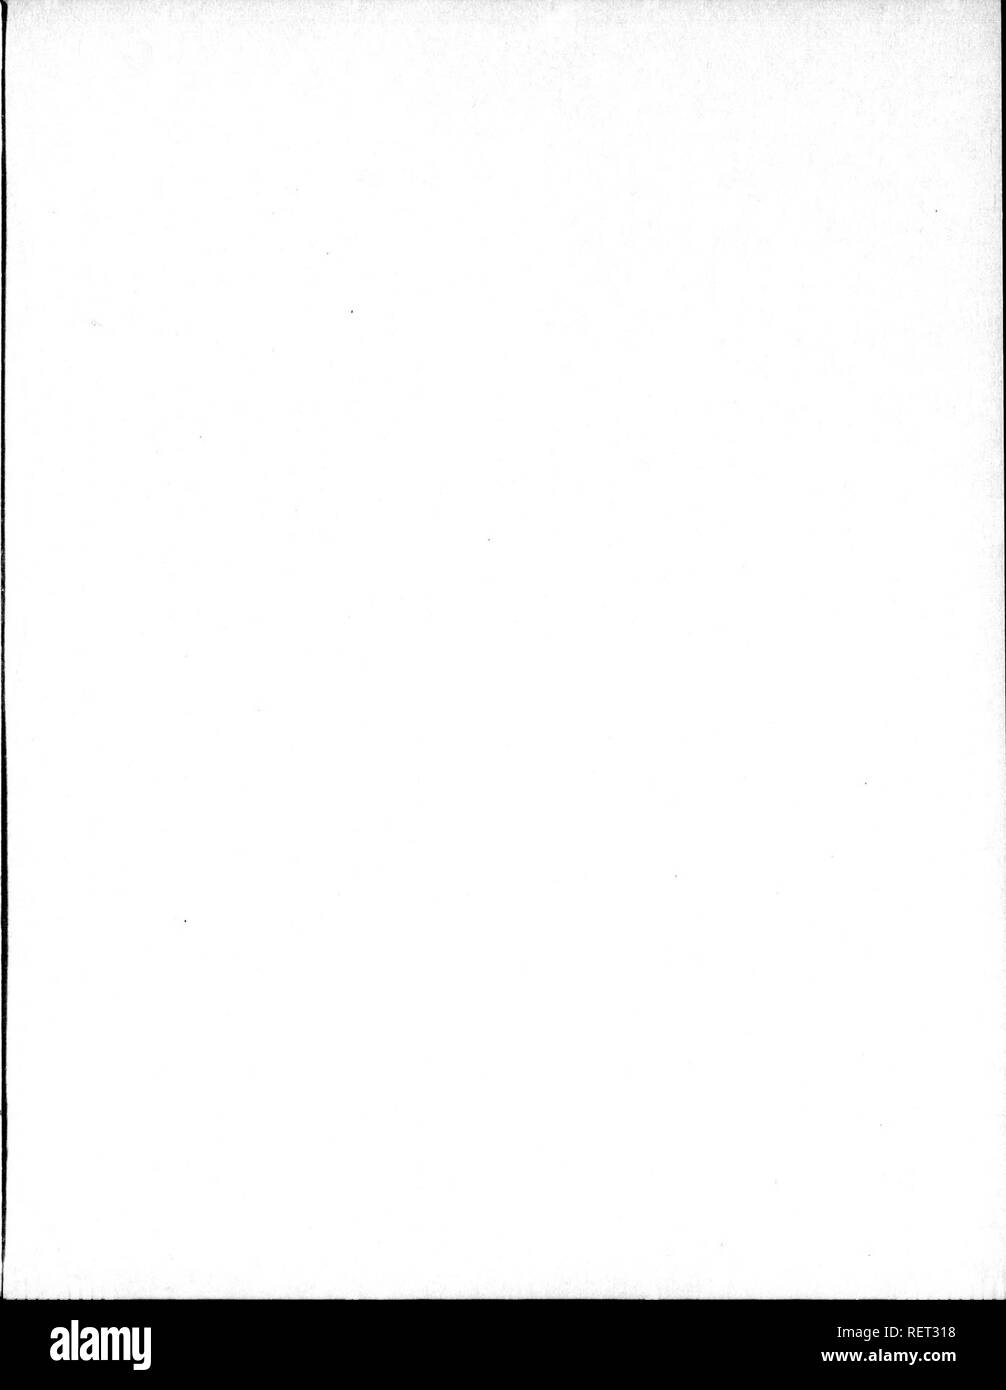 . Histoire naturelle, générale et particulière [microforme] : servant de suite à l'histoire des animaux quadrupèdes. Sciences naturelles; Natural history. . Please note that these images are extracted from scanned page images that may have been digitally enhanced for readability - coloration and appearance of these illustrations may not perfectly resemble the original work.. Buffon, Georges Louis Leclerc, comte de, 1707-1788. A Paris : De l'Imprimerie royale - Stock Image